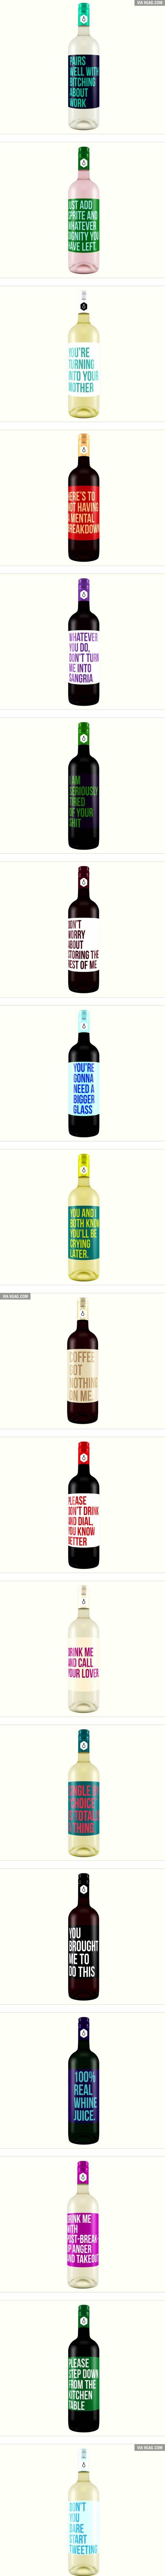 Brutally Honest Wine Labels - 9GAG